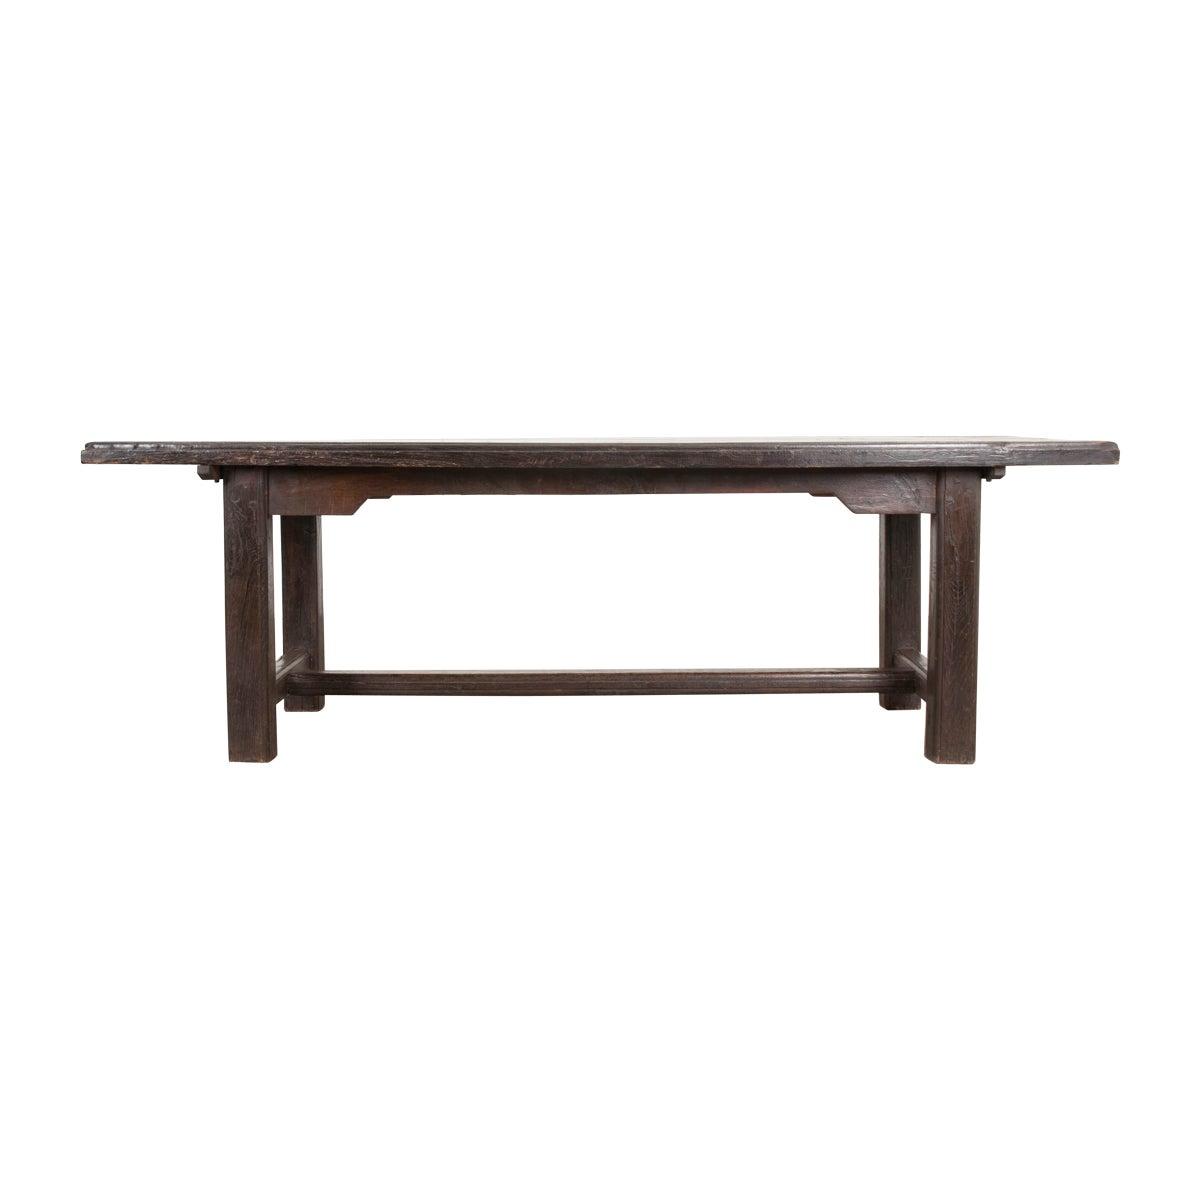 French 19th Century Provincial Oak Trestled Farm Table